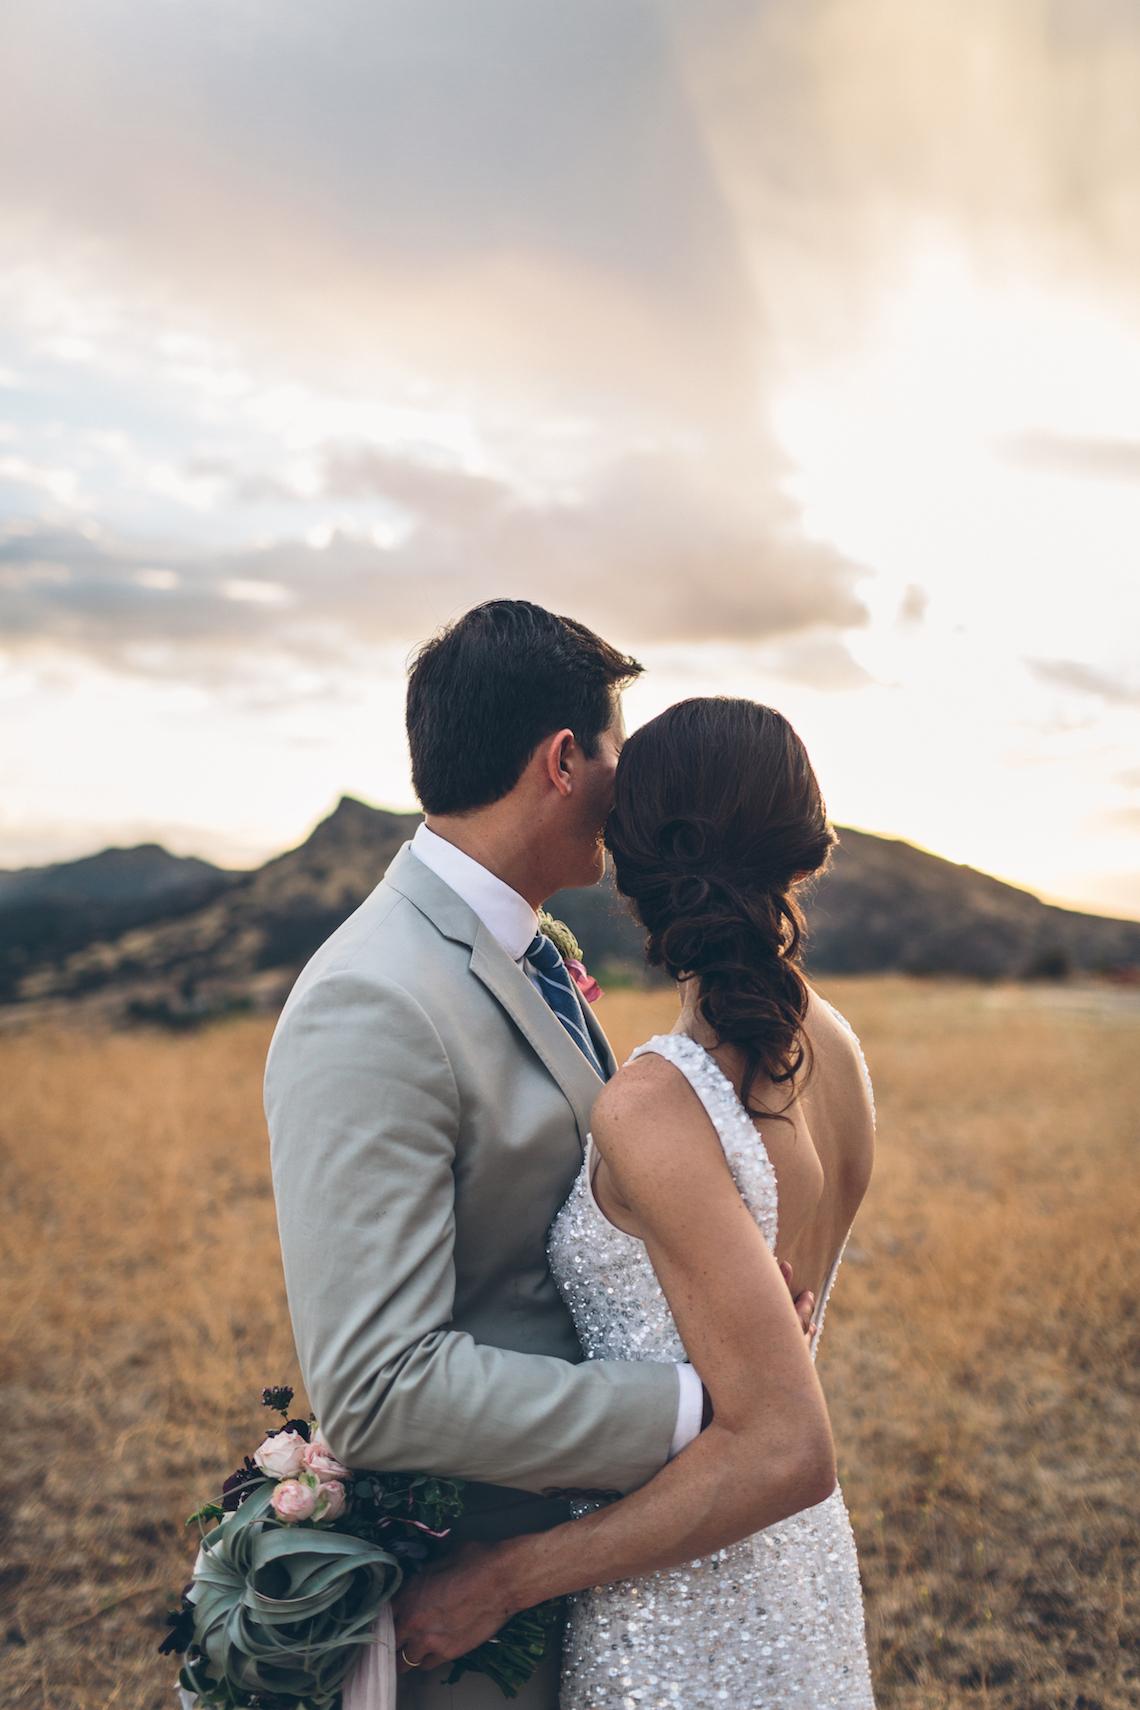 Rich & Rustic Malibu Mountains Ranch Wedding Inspiration | Vitae Weddings 35